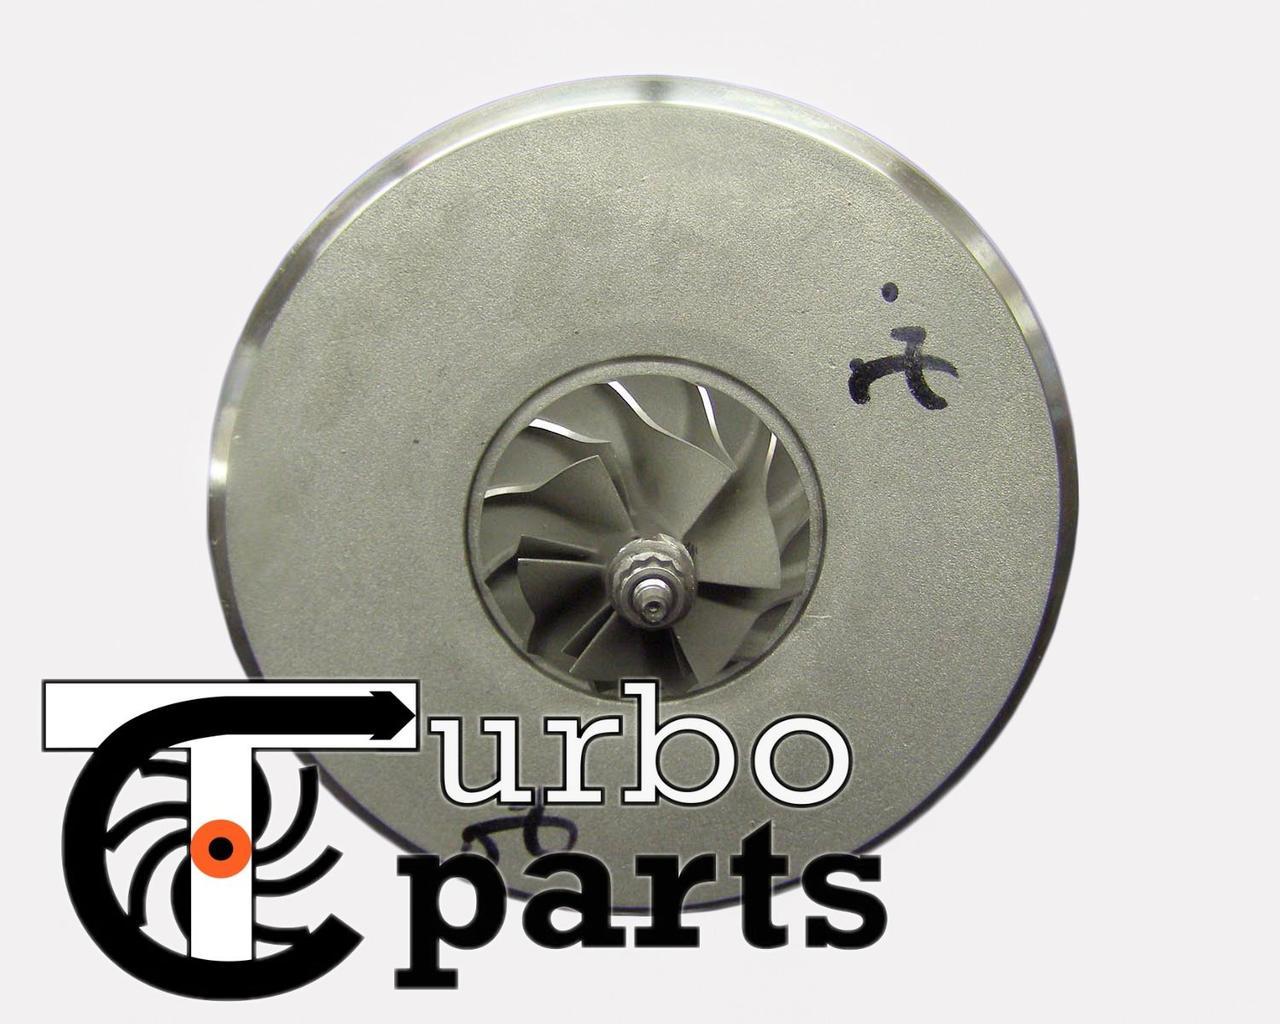 Картридж турбины Citreon 2.0HDI C8/ C5/ Berlingo/ Xsara/ Xsantia/ Evasion/ Jumpy - 706976, 706977, 706978